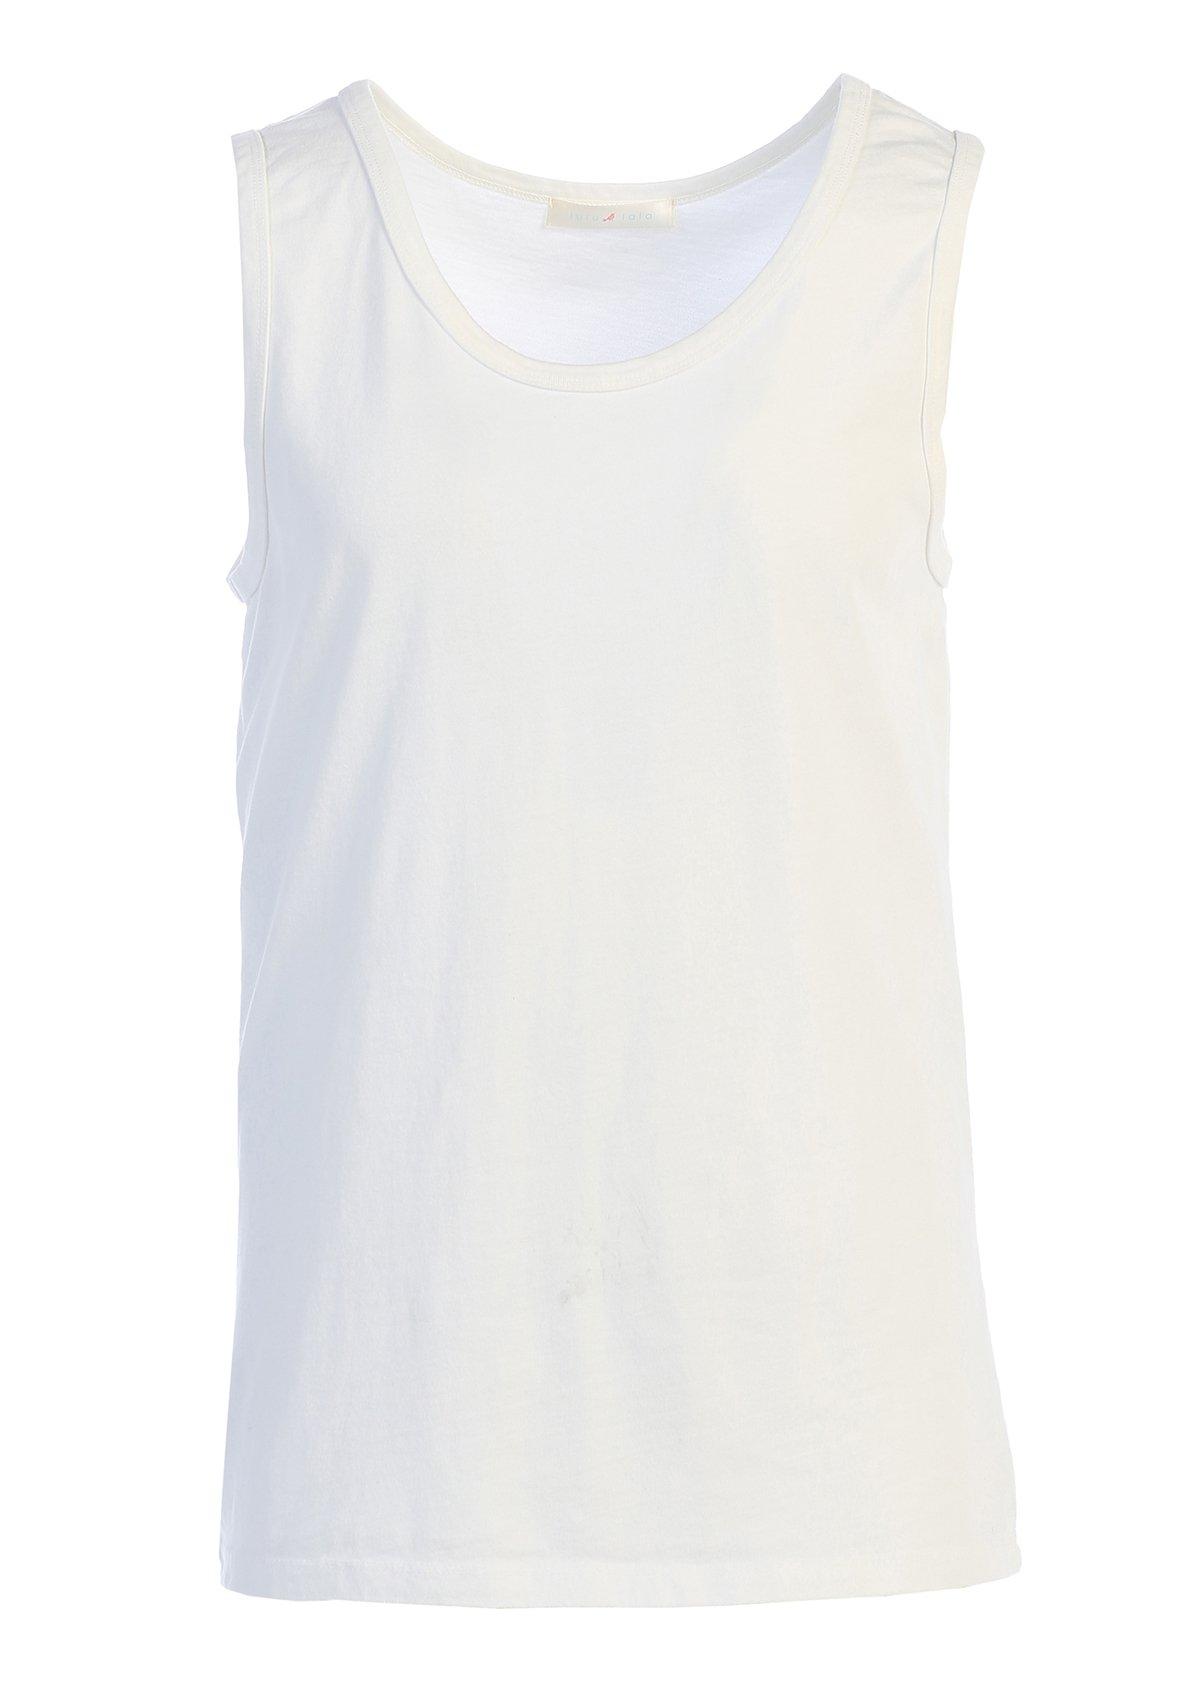 LAFSQ Unisex Plain Classic Style Premium Fine Jersey T-Shirt Tank Top, Made In USA (White, S)